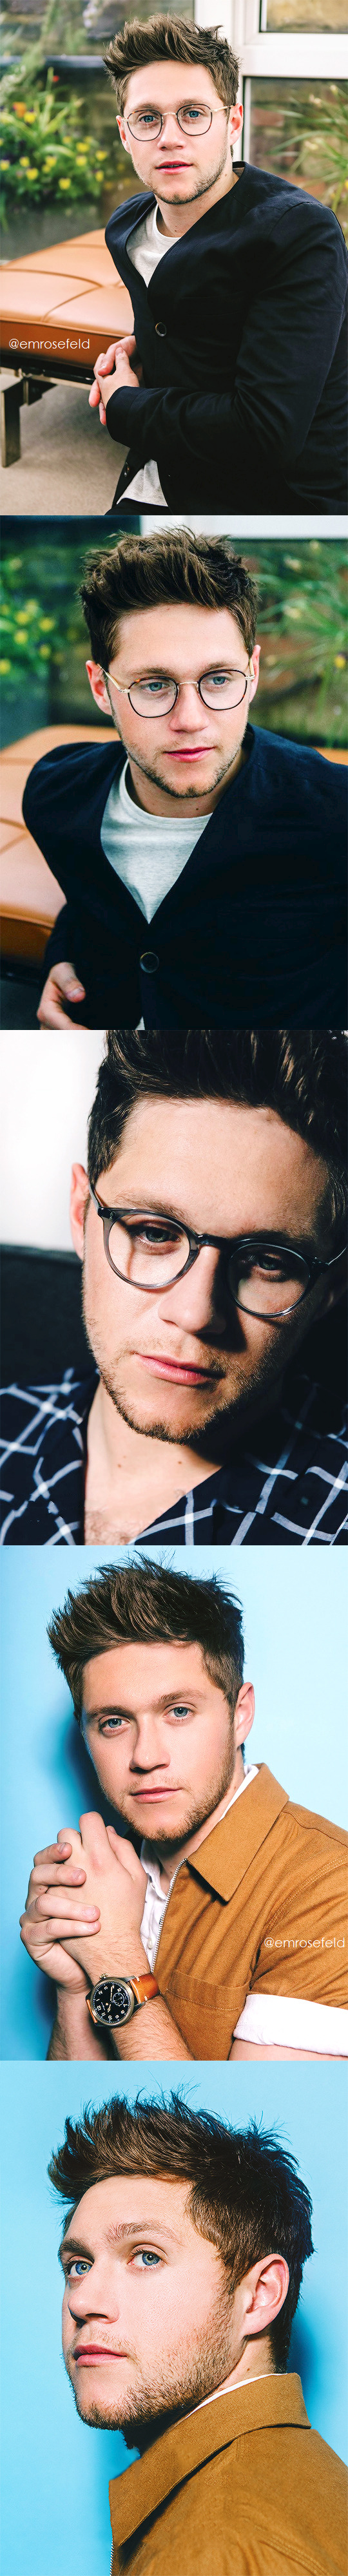 Niall Horan | for TMRW Magazine | emrosefeld |